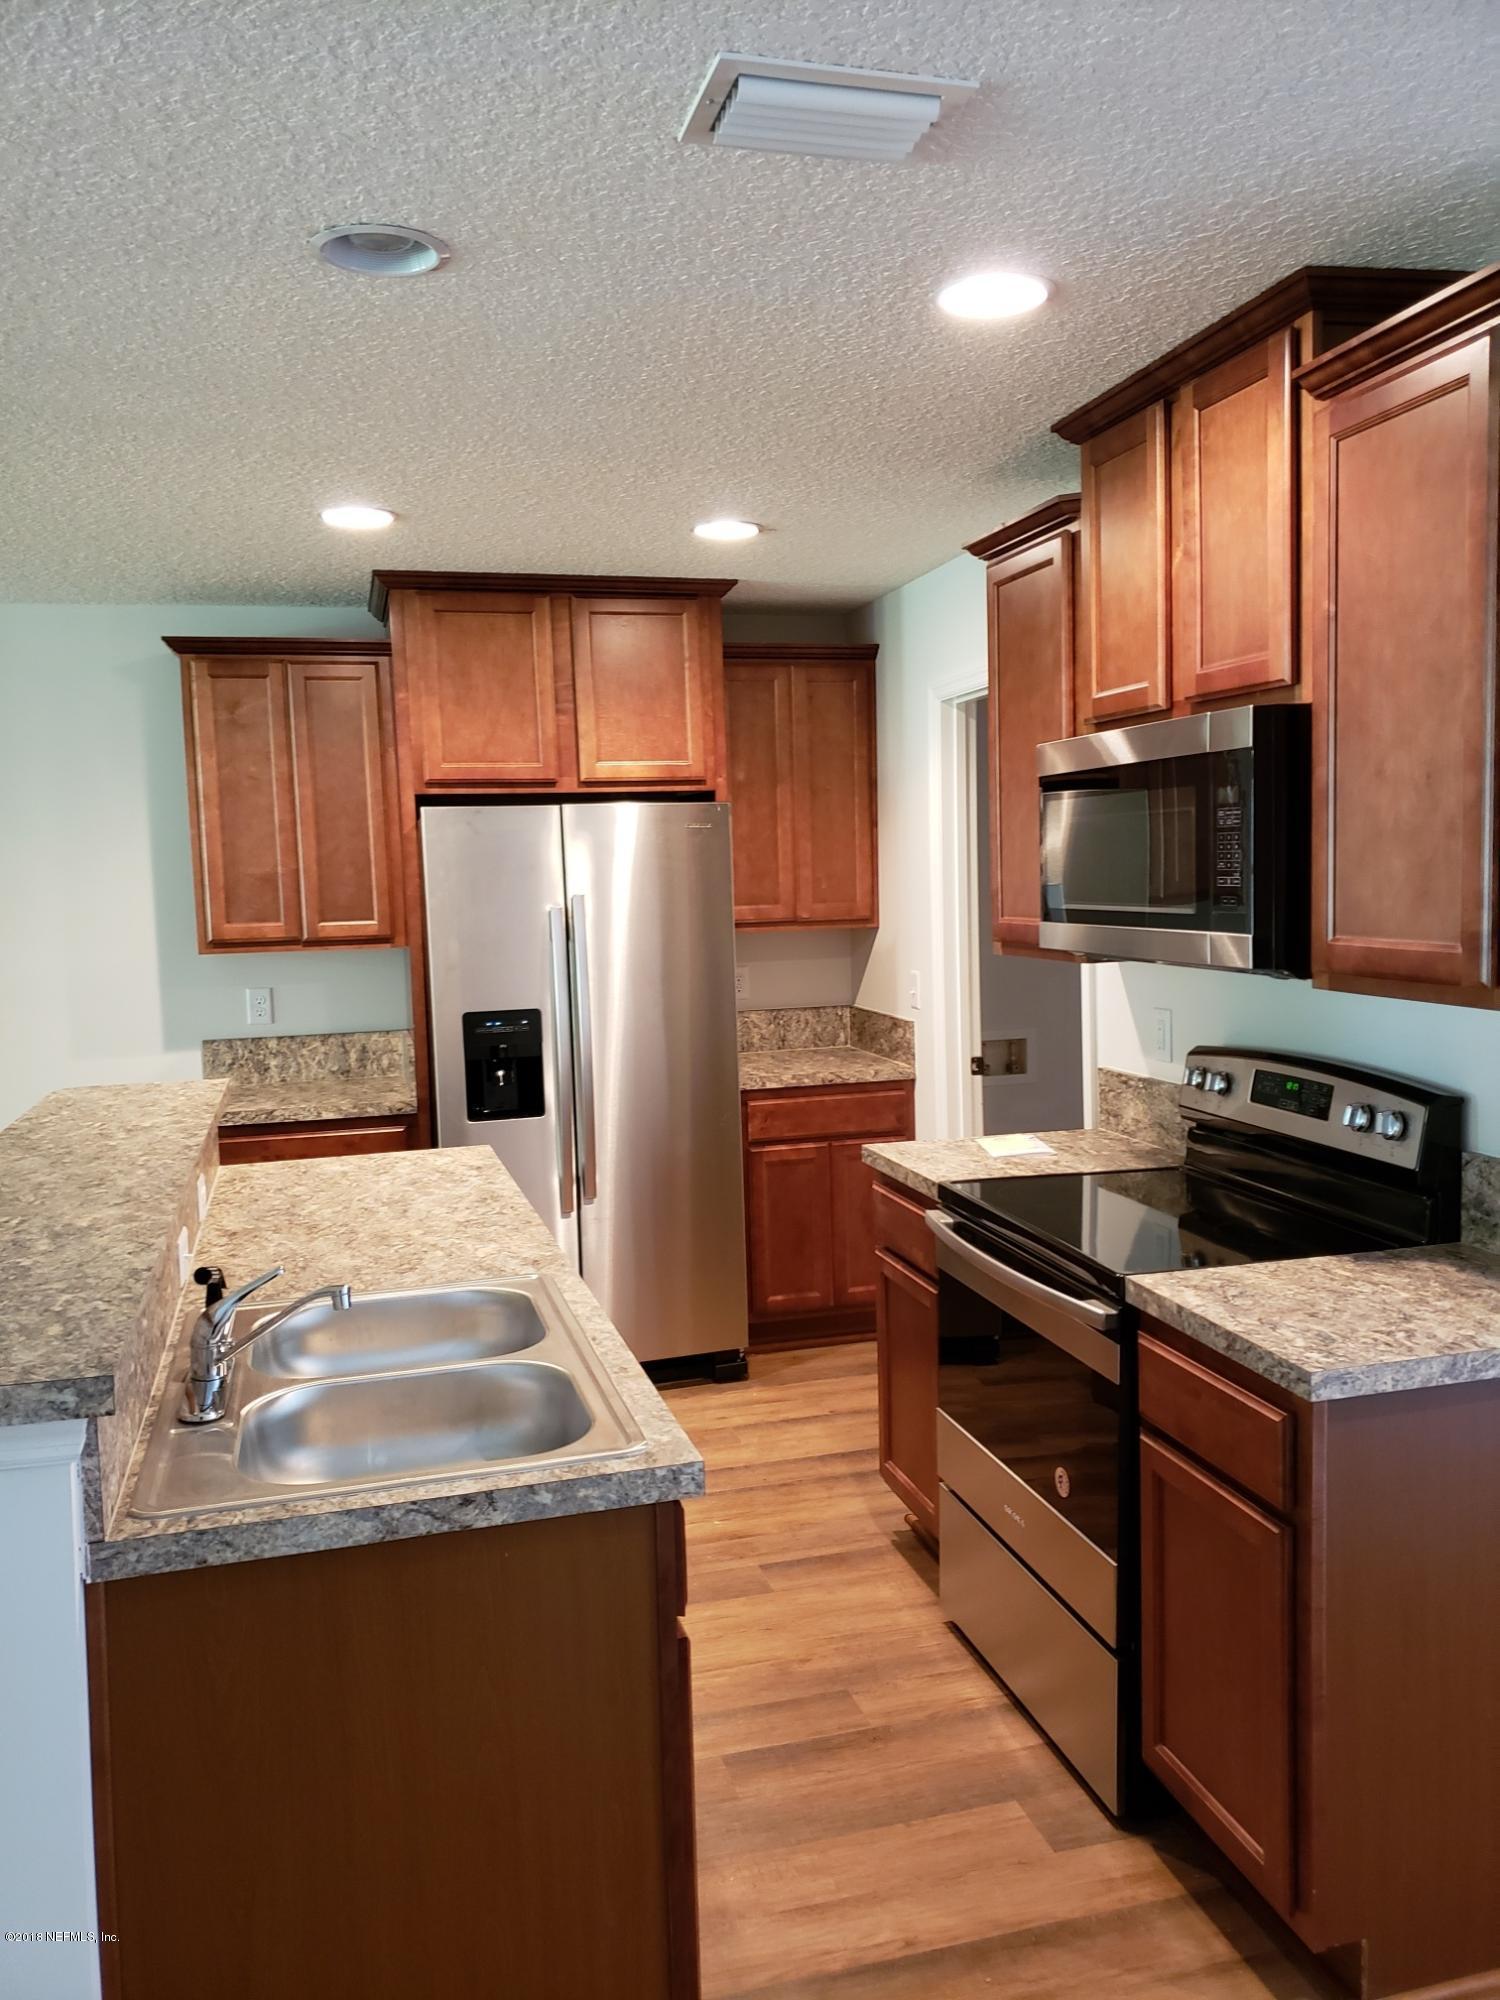 386 OLD JENNINGS, ORANGE PARK, FLORIDA 32065, 3 Bedrooms Bedrooms, ,2 BathroomsBathrooms,Residential - townhome,For sale,OLD JENNINGS,902798